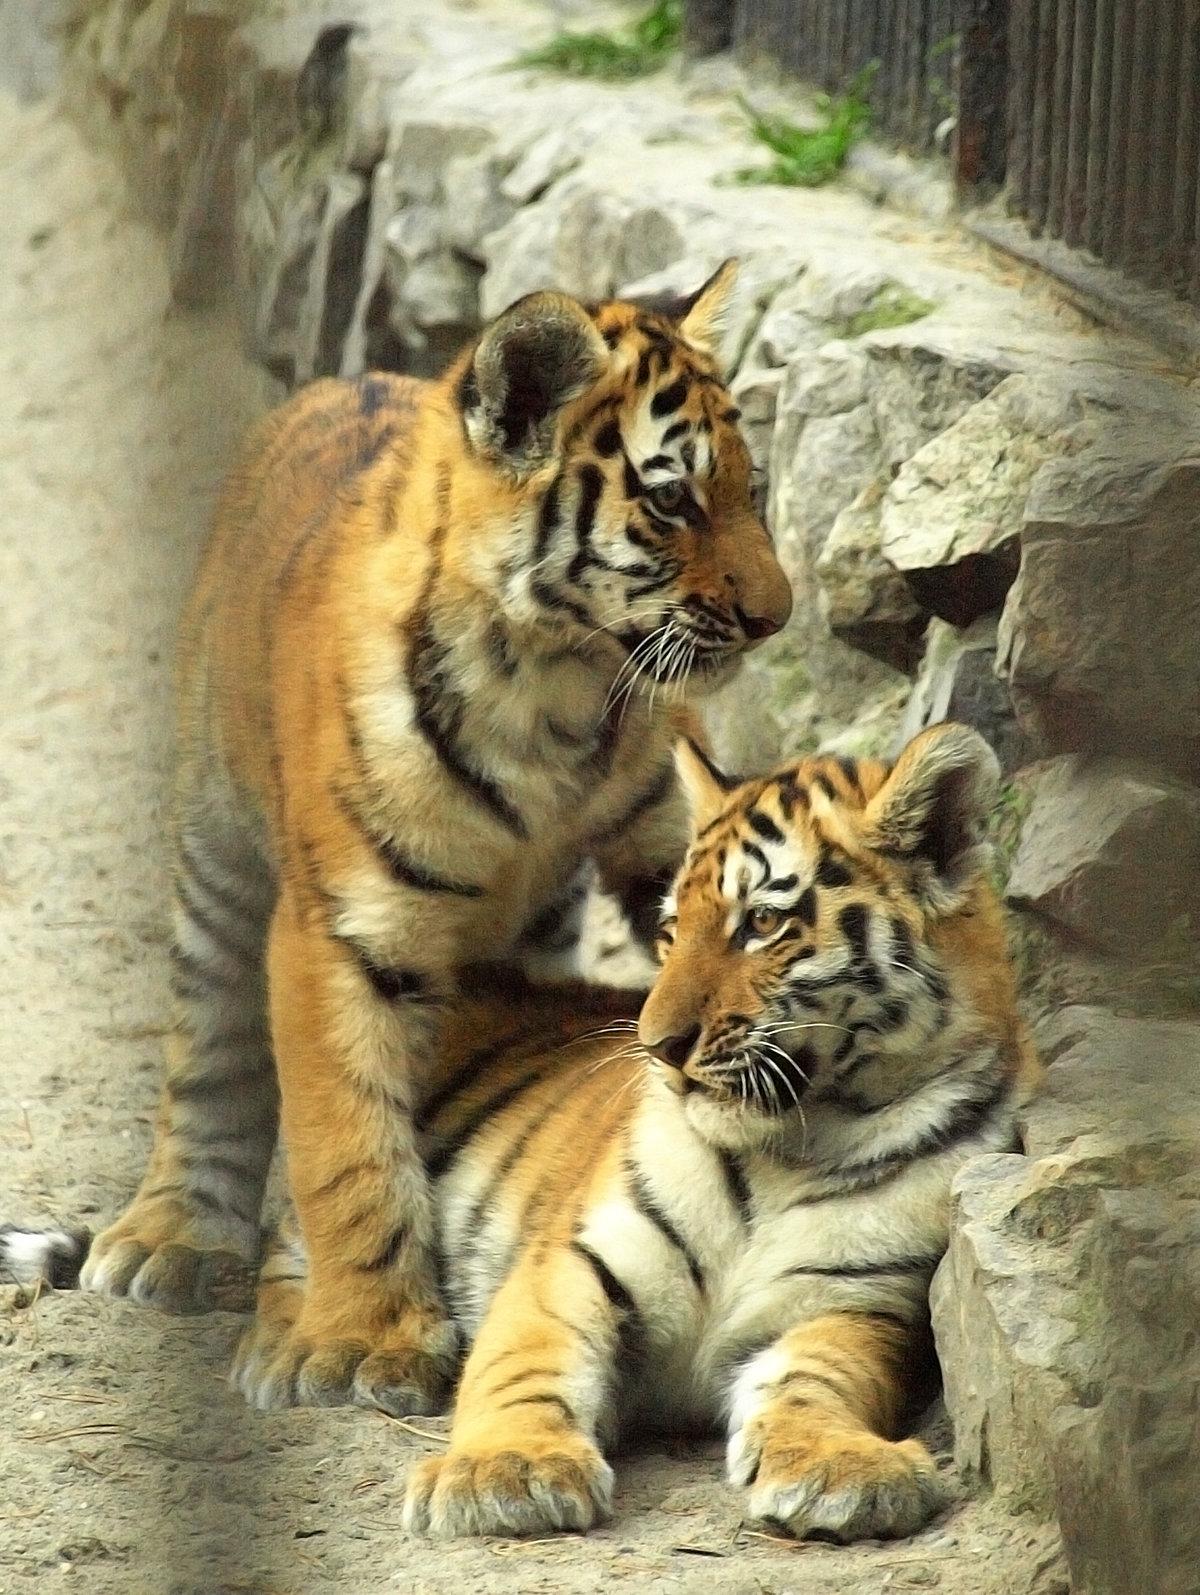 Тигрята#животные #звери #зоопарк #котята #кошачьи #кошки #новосибирск #природа #тигр #тигренок #тигрята #фауна #Ñищники